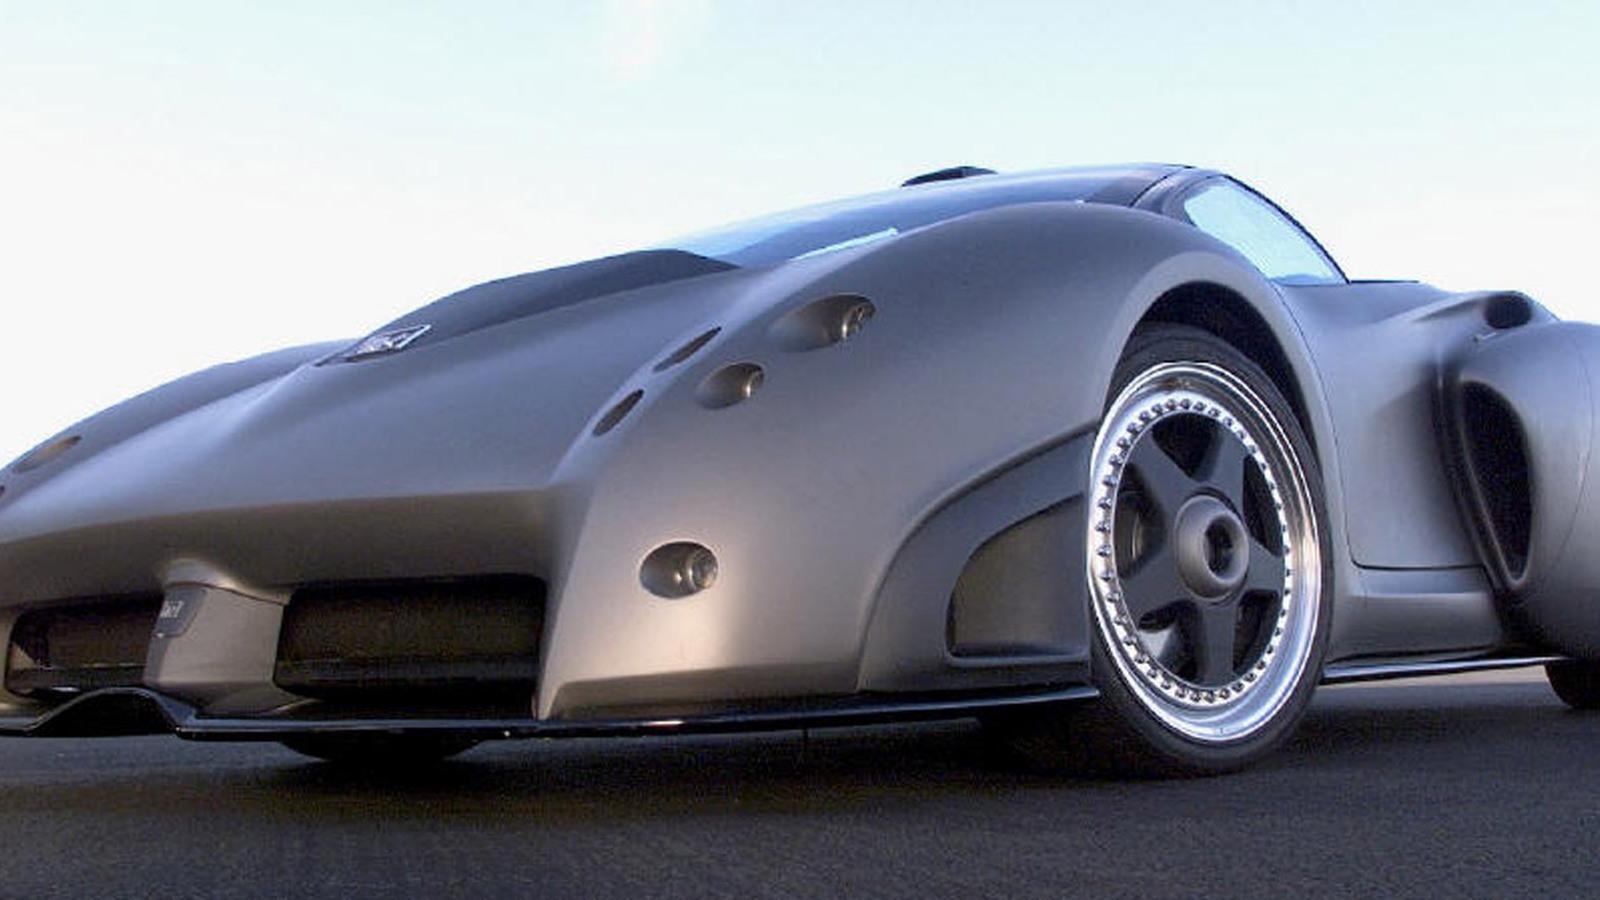 1998 Lamborghini Pregunta prototype